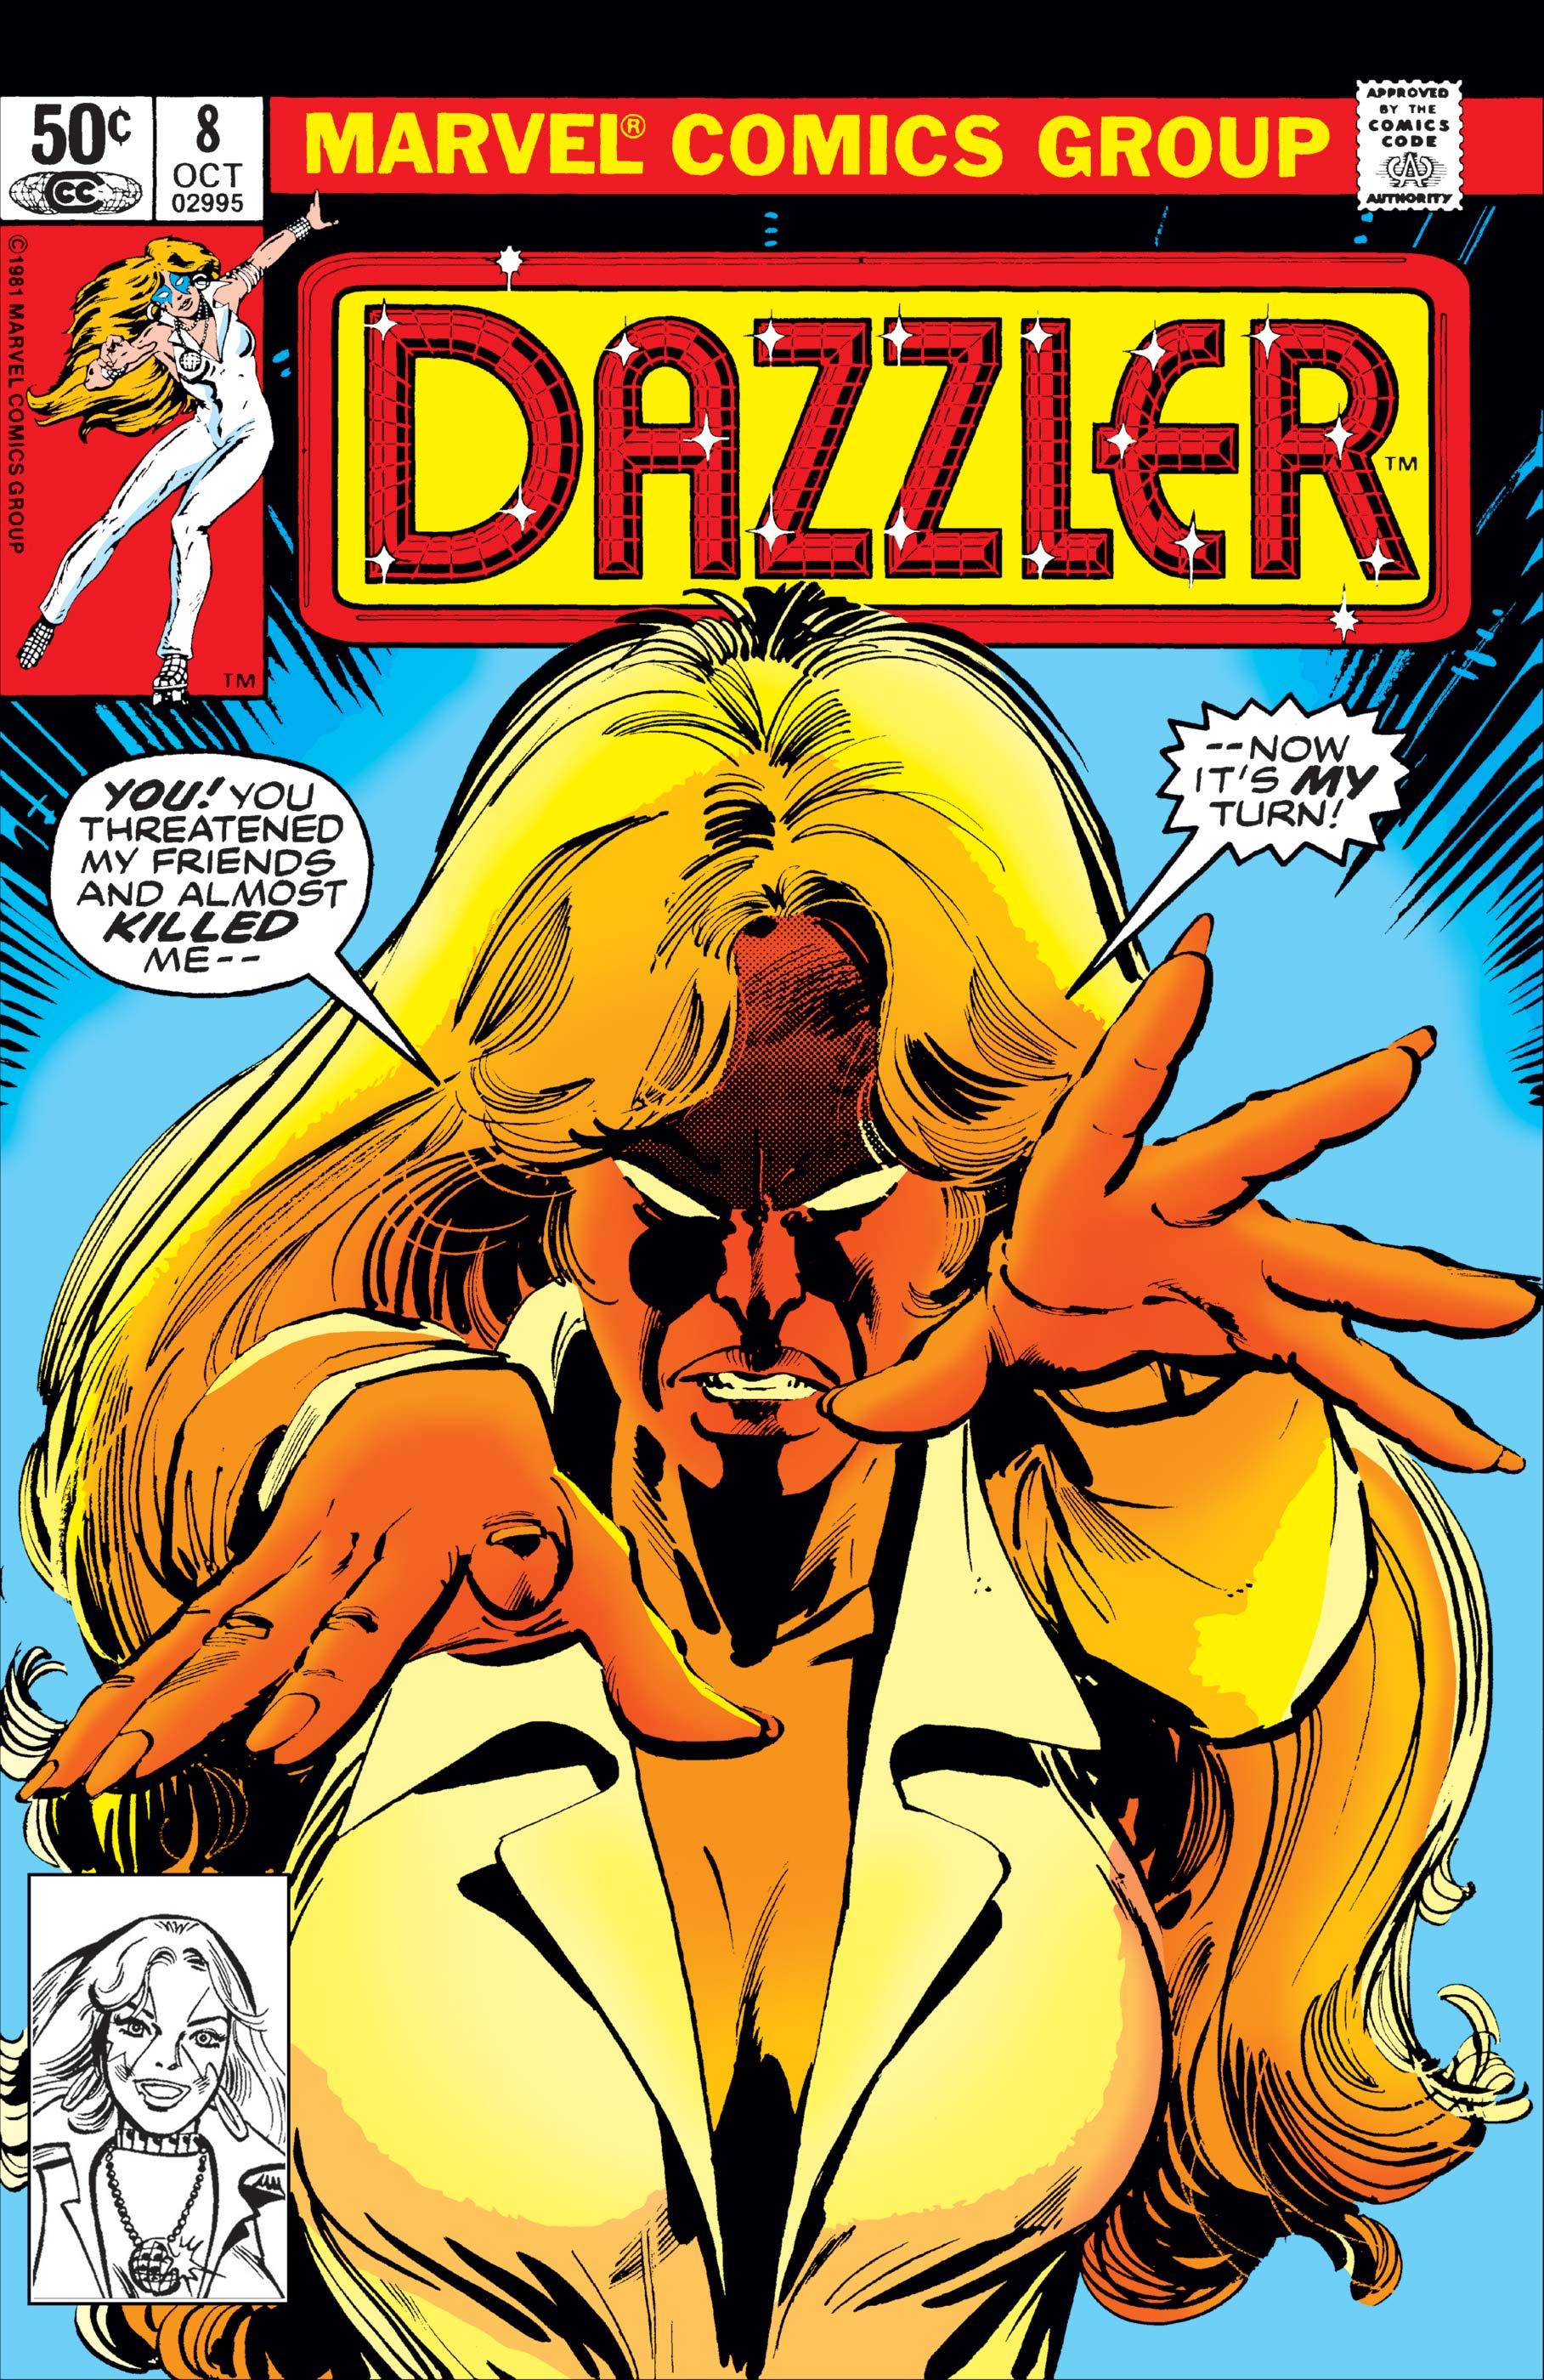 Dazzler (1981) #8